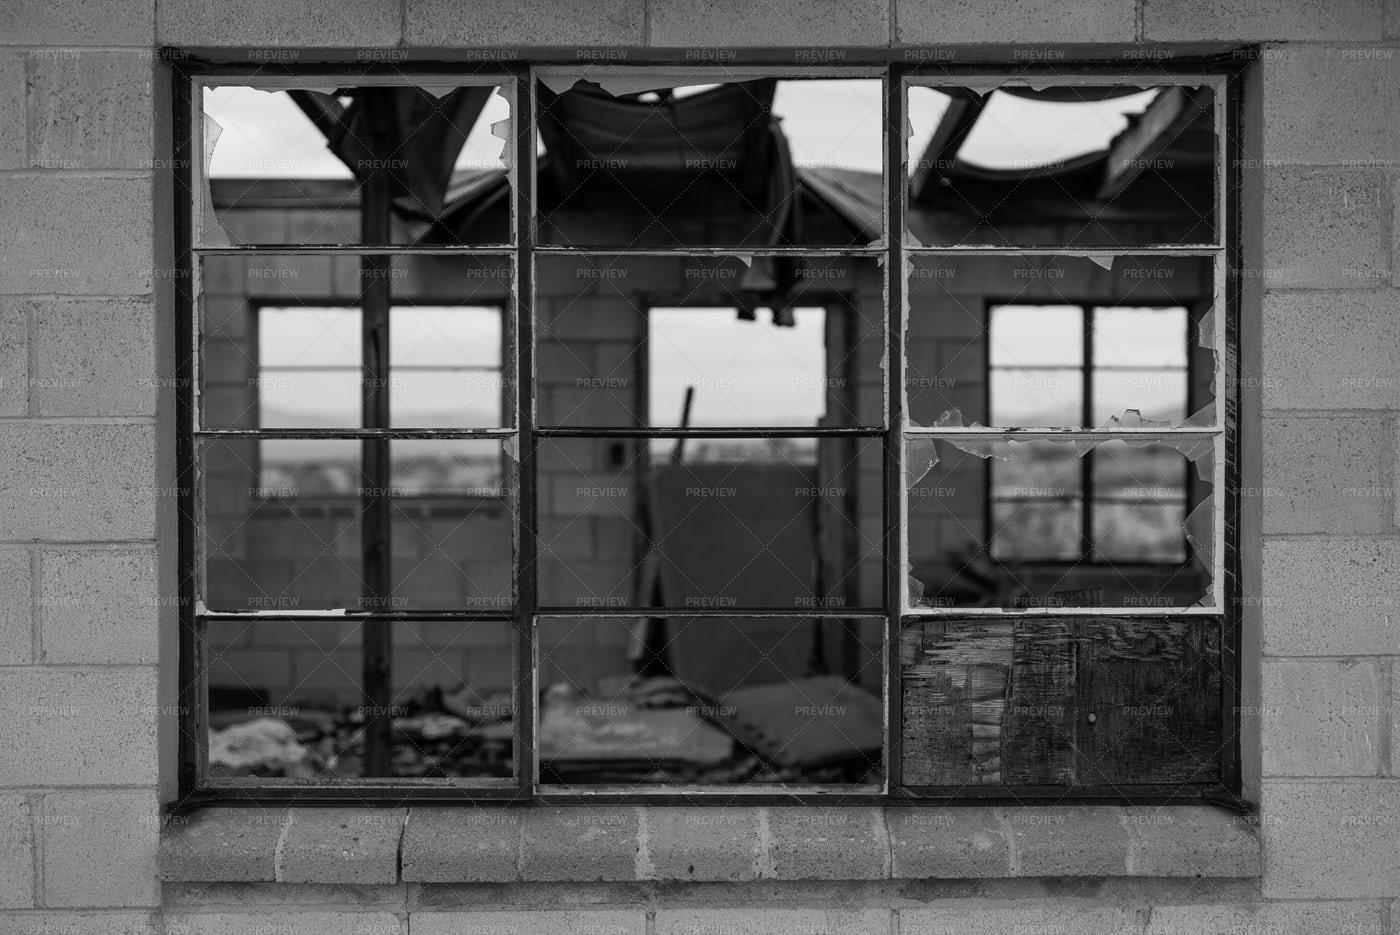 Window In A Derelict Building: Stock Photos